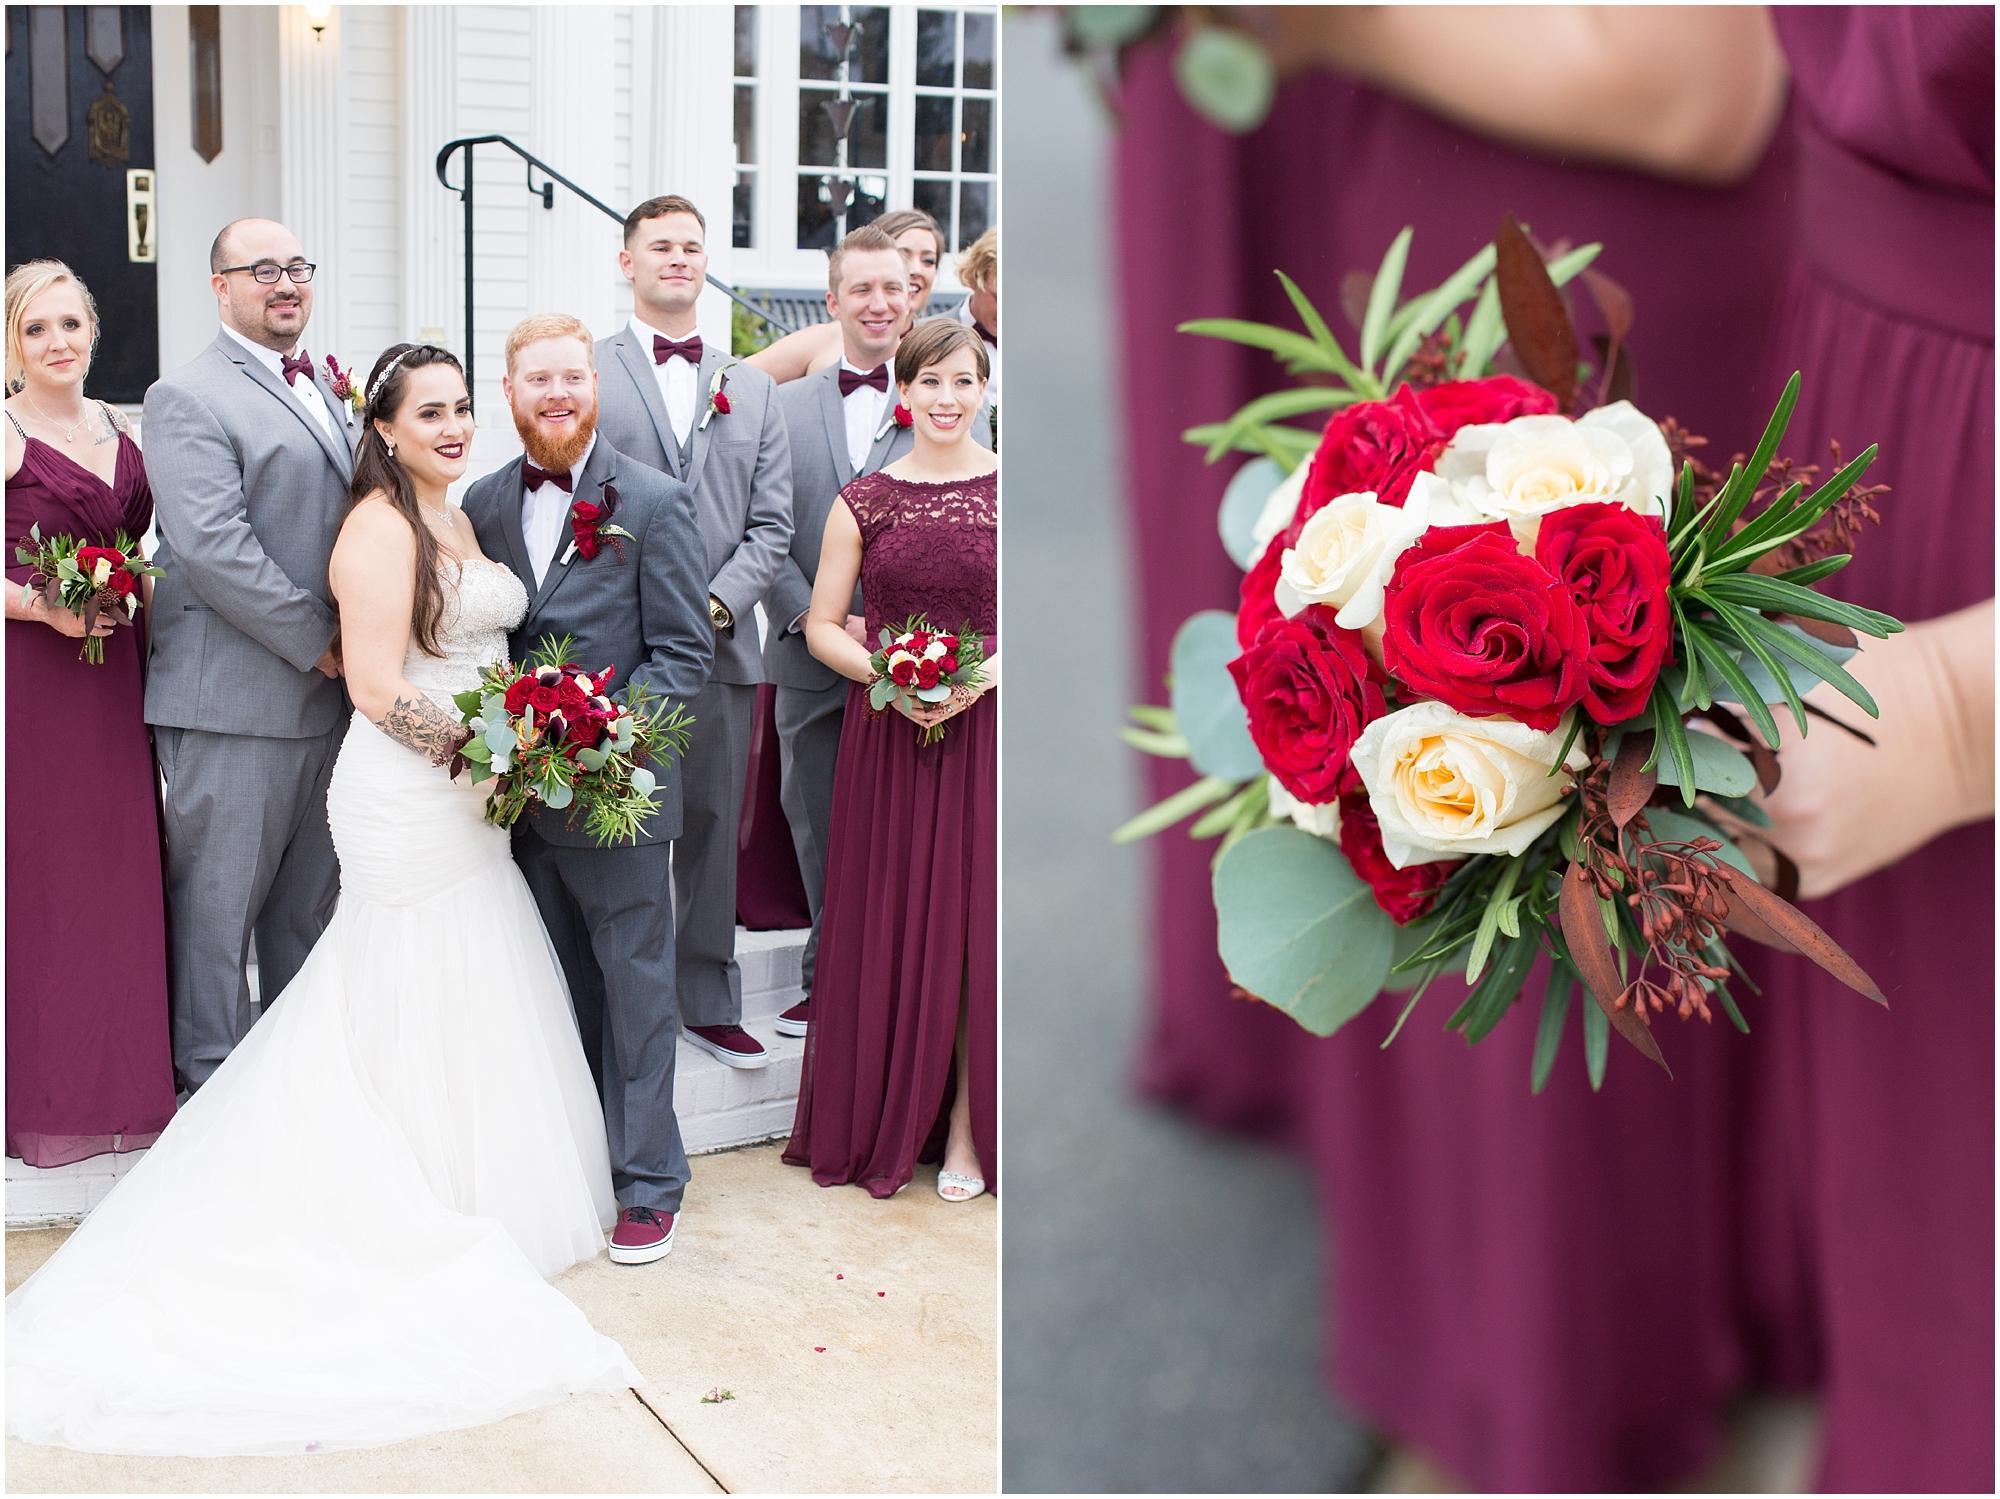 gourmet gang, florist, obici house wedding in suffolk virginia, virginia wedding photographer